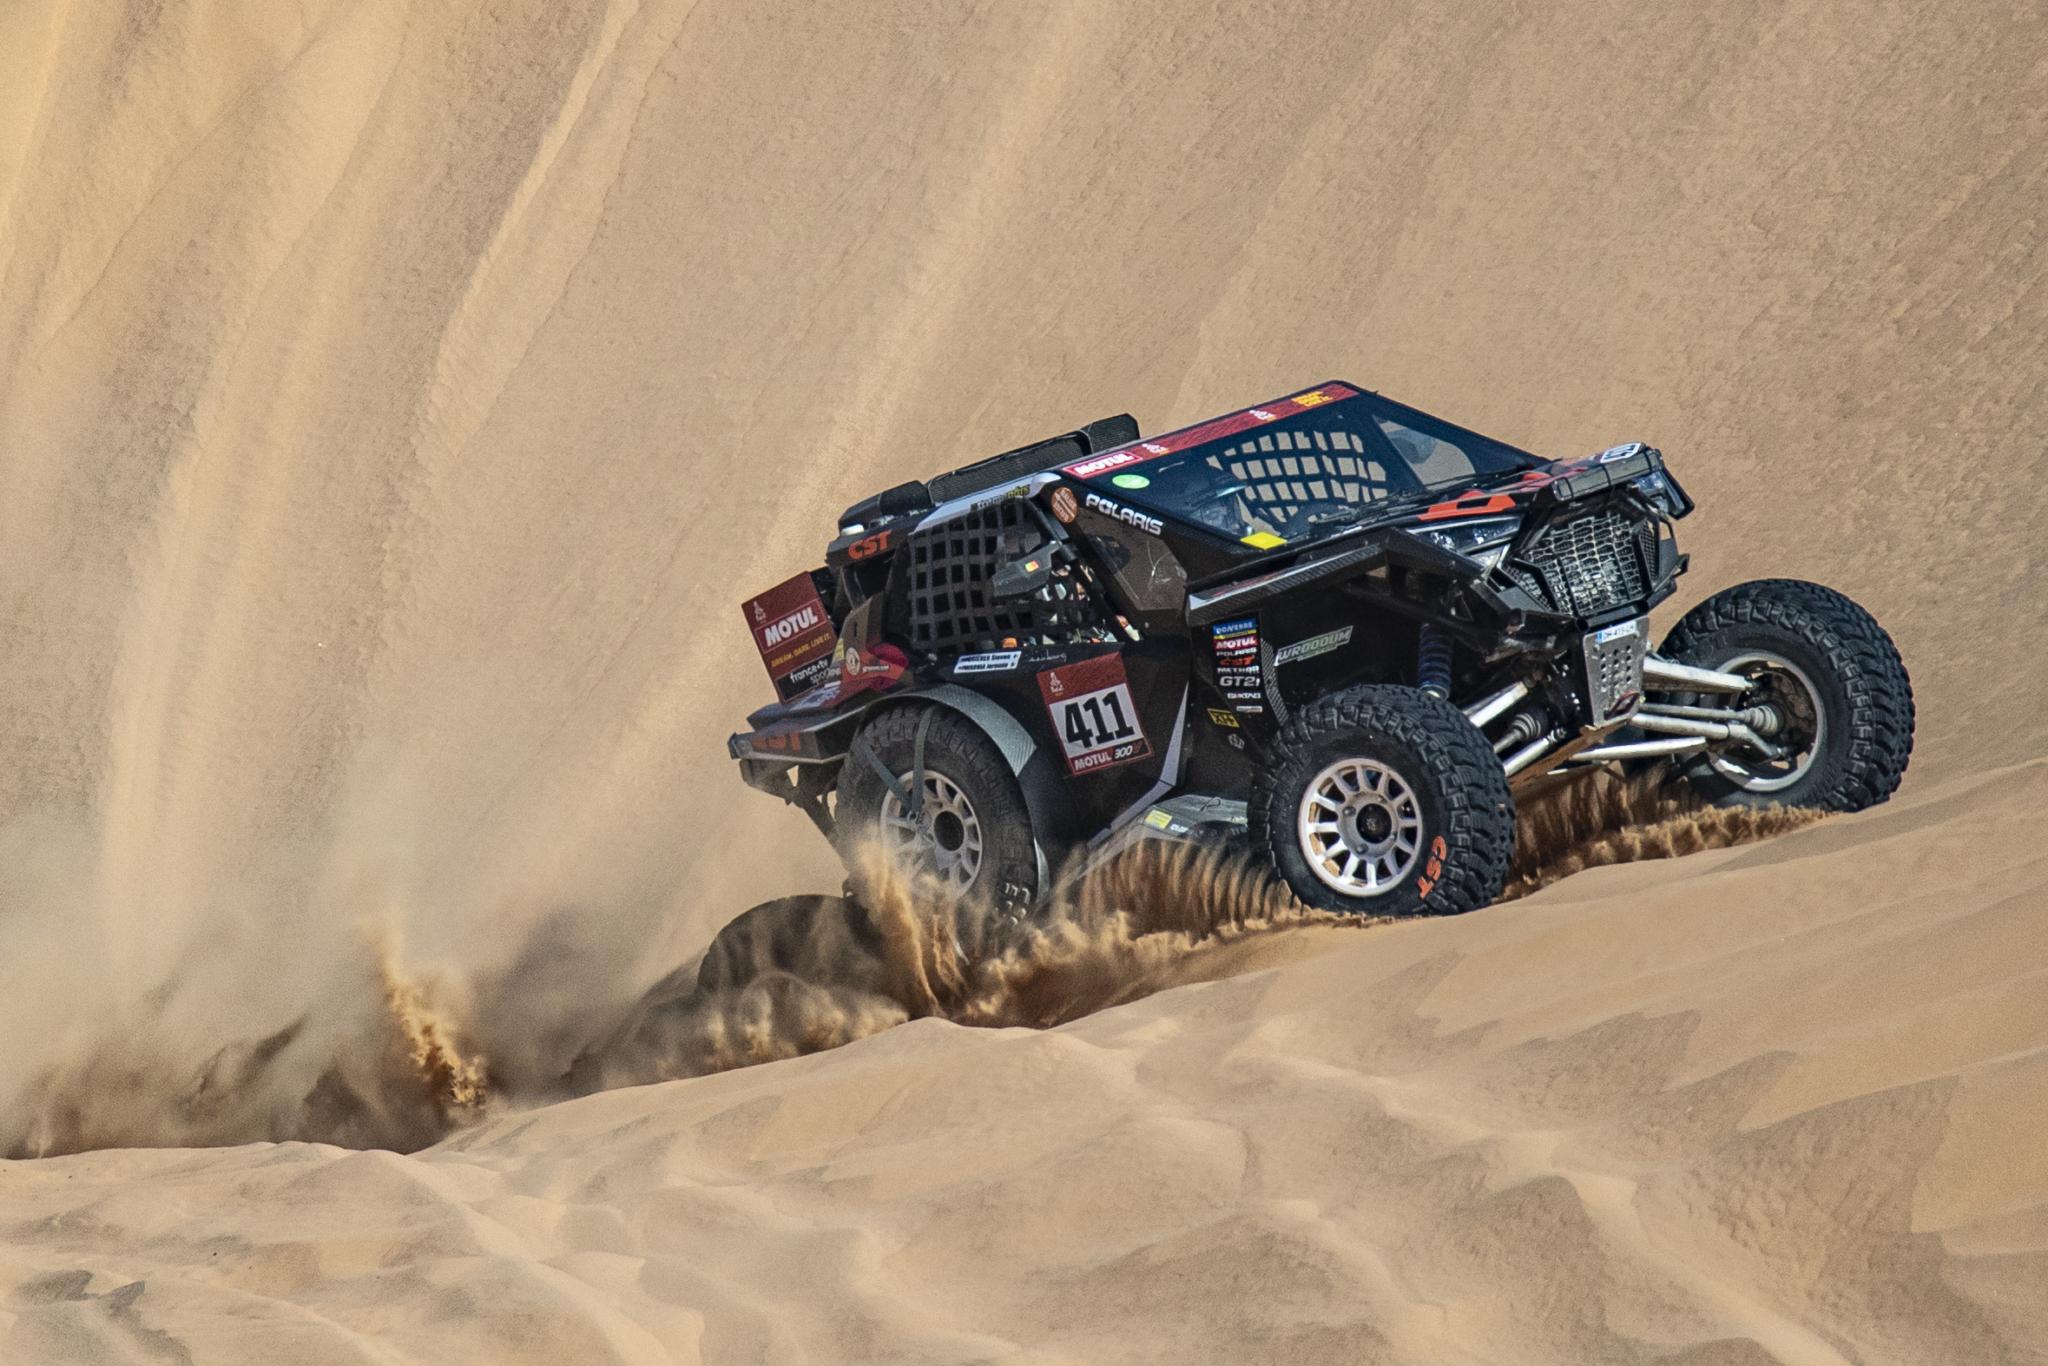 CST Apache supports Xtreme+ team on 2021 Dakar Rally